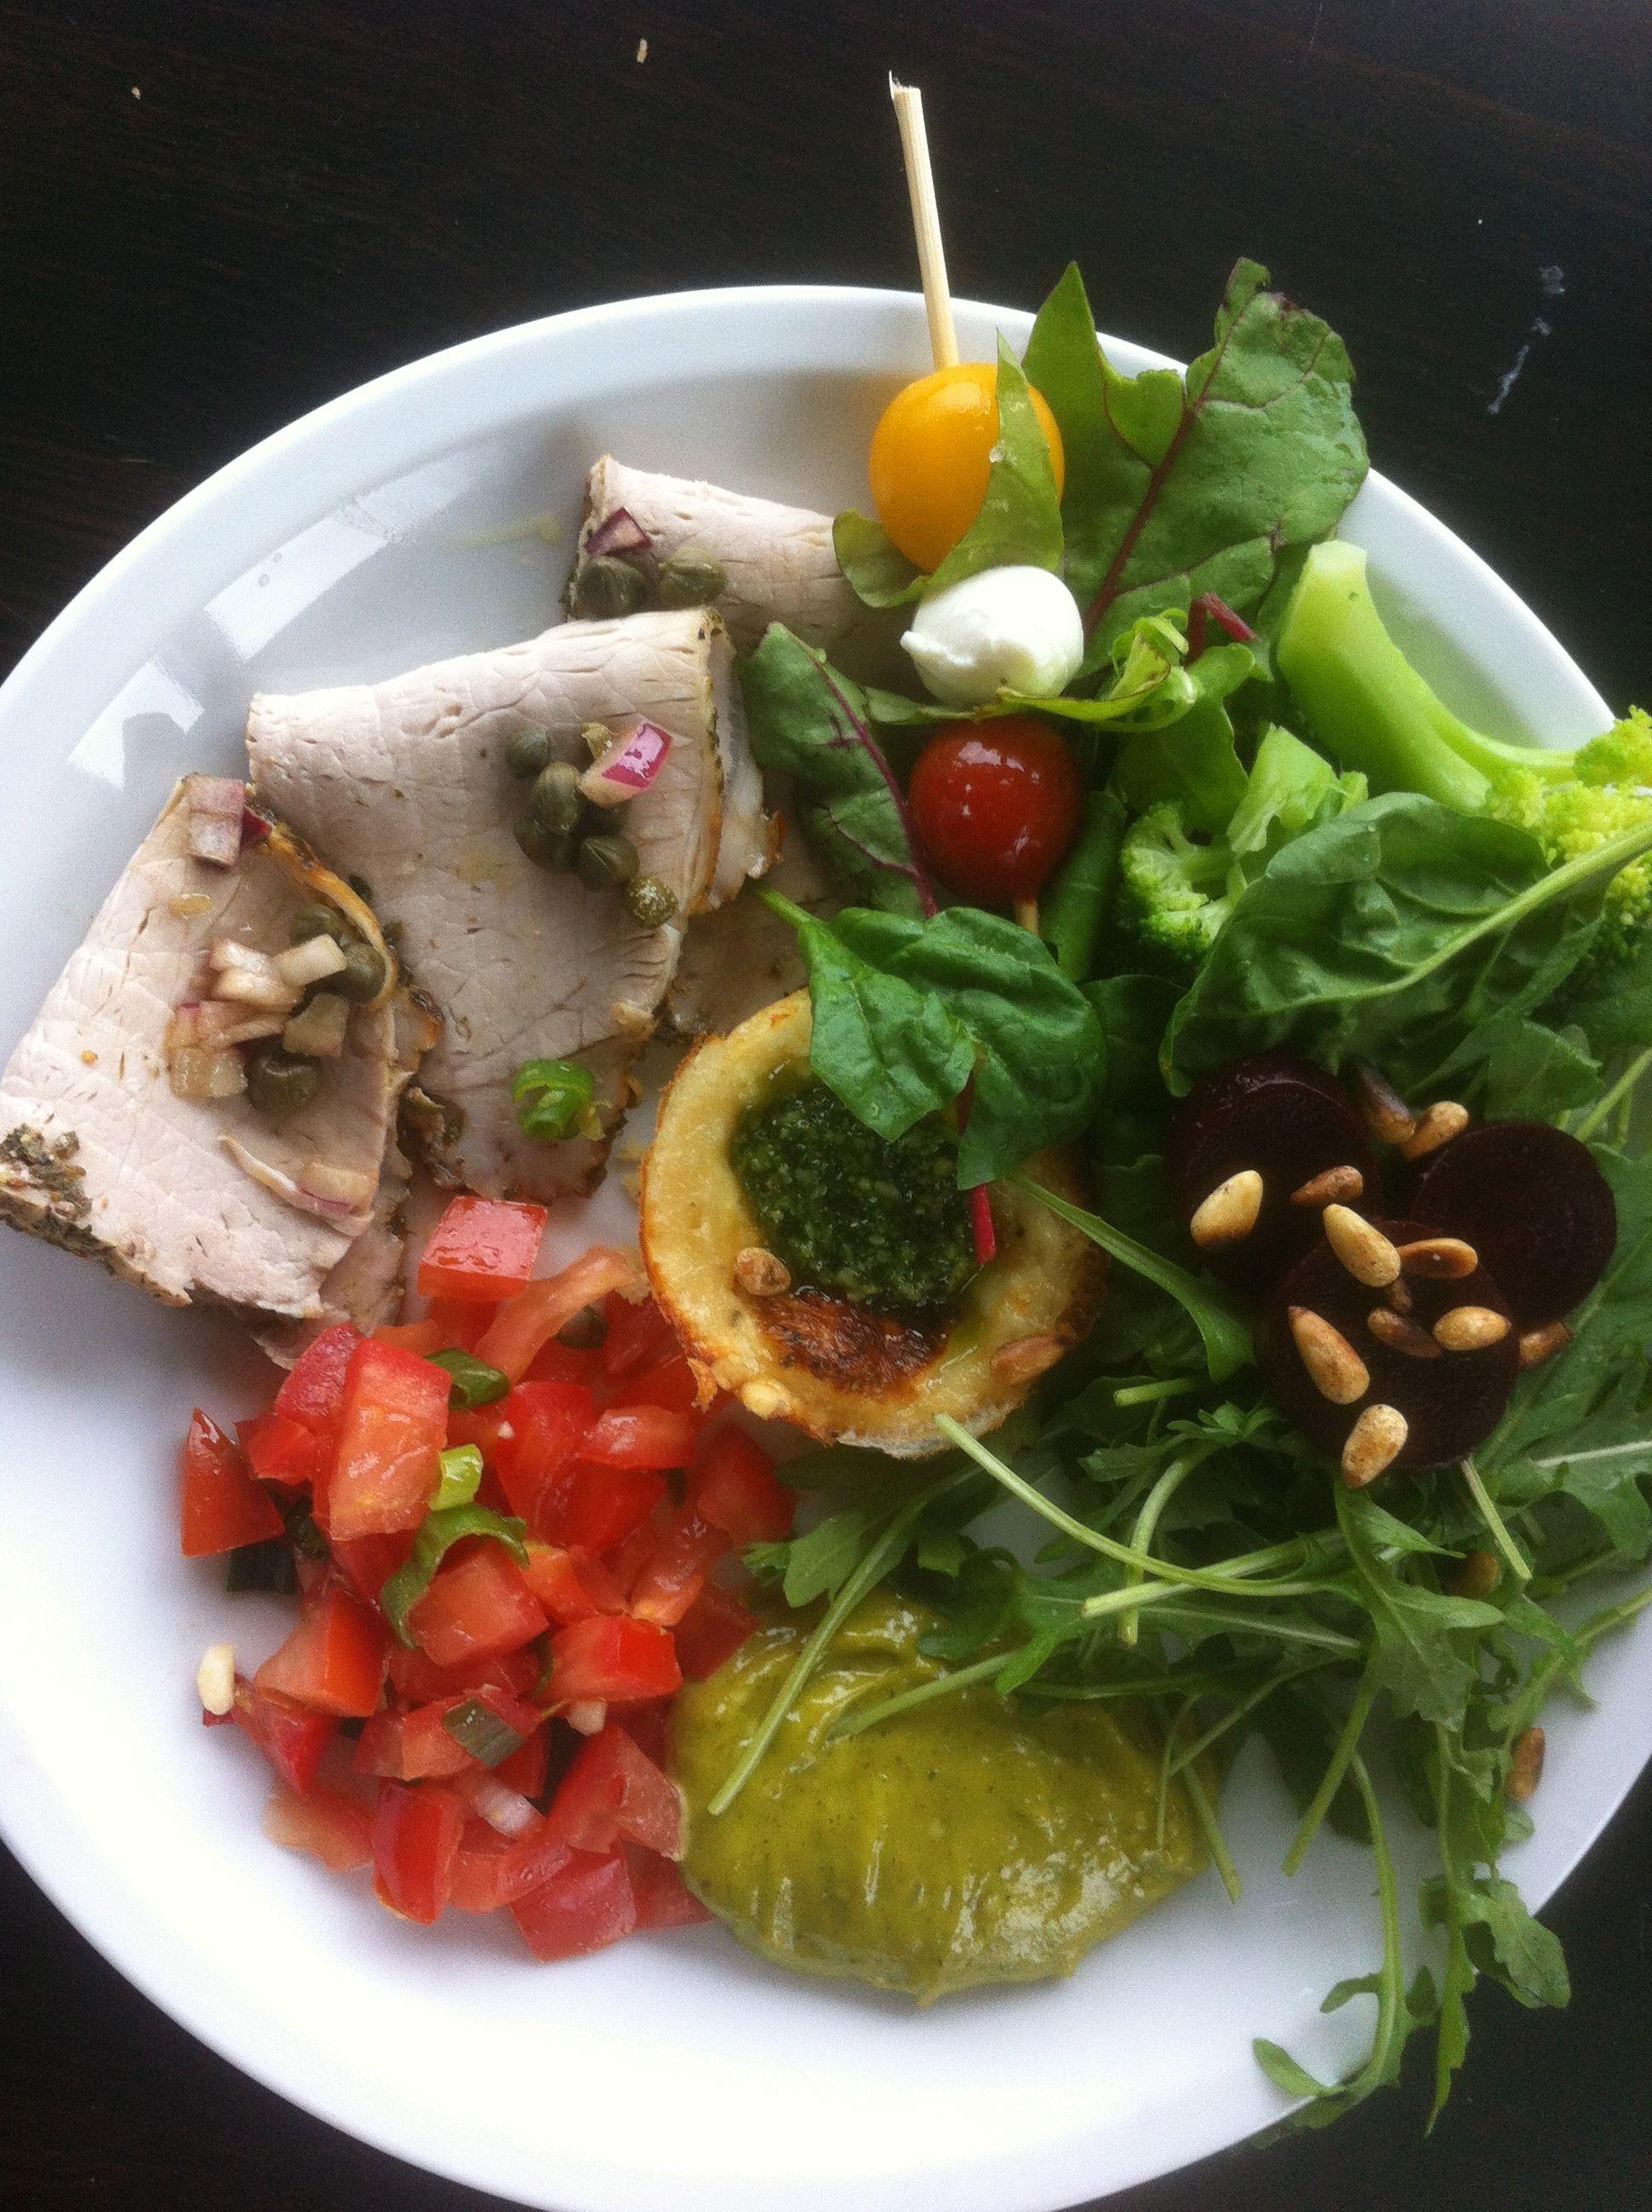 Mat från min buffé #AnnaHarald